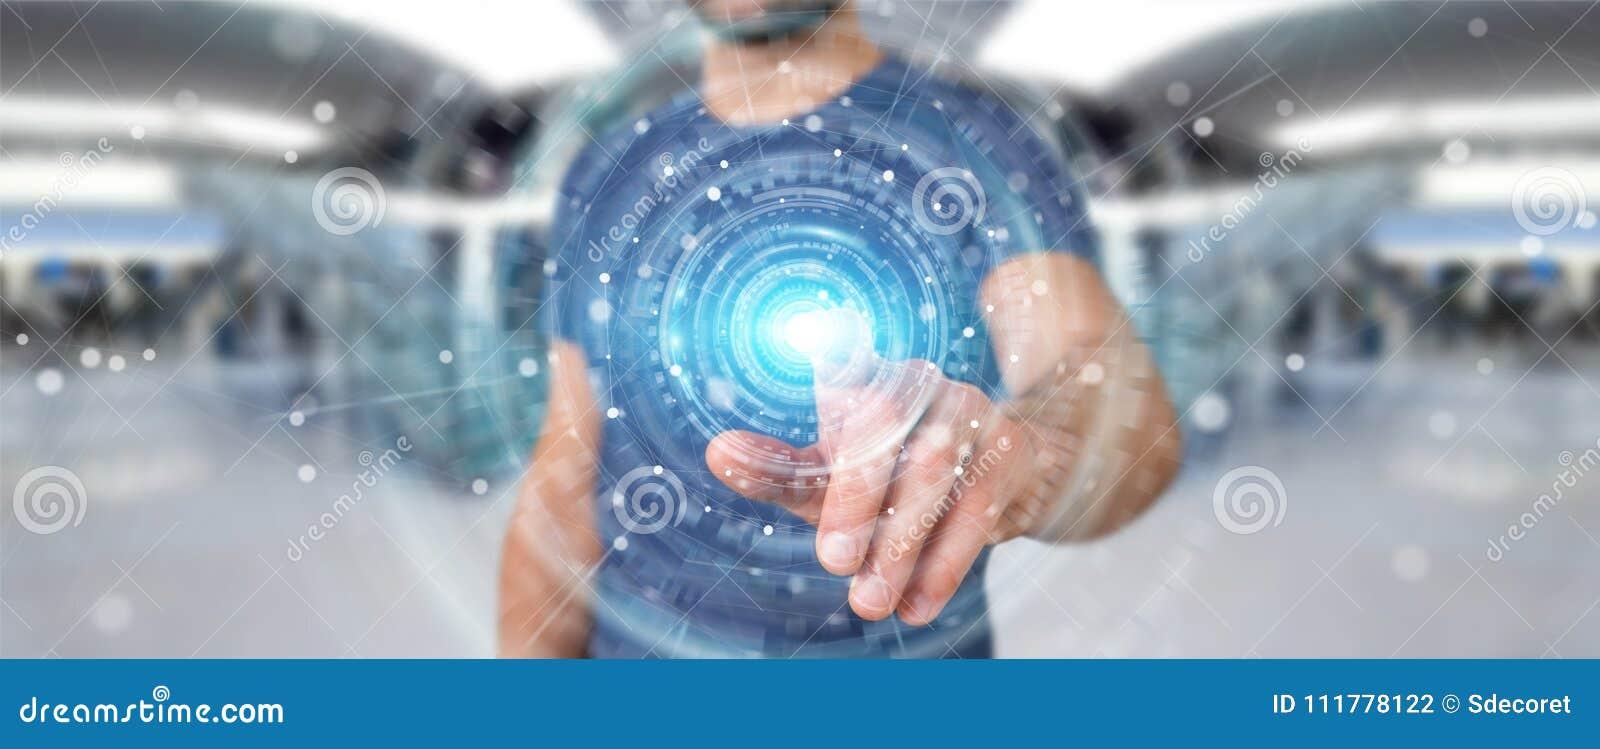 Businessman using digital network connection interface 3D render